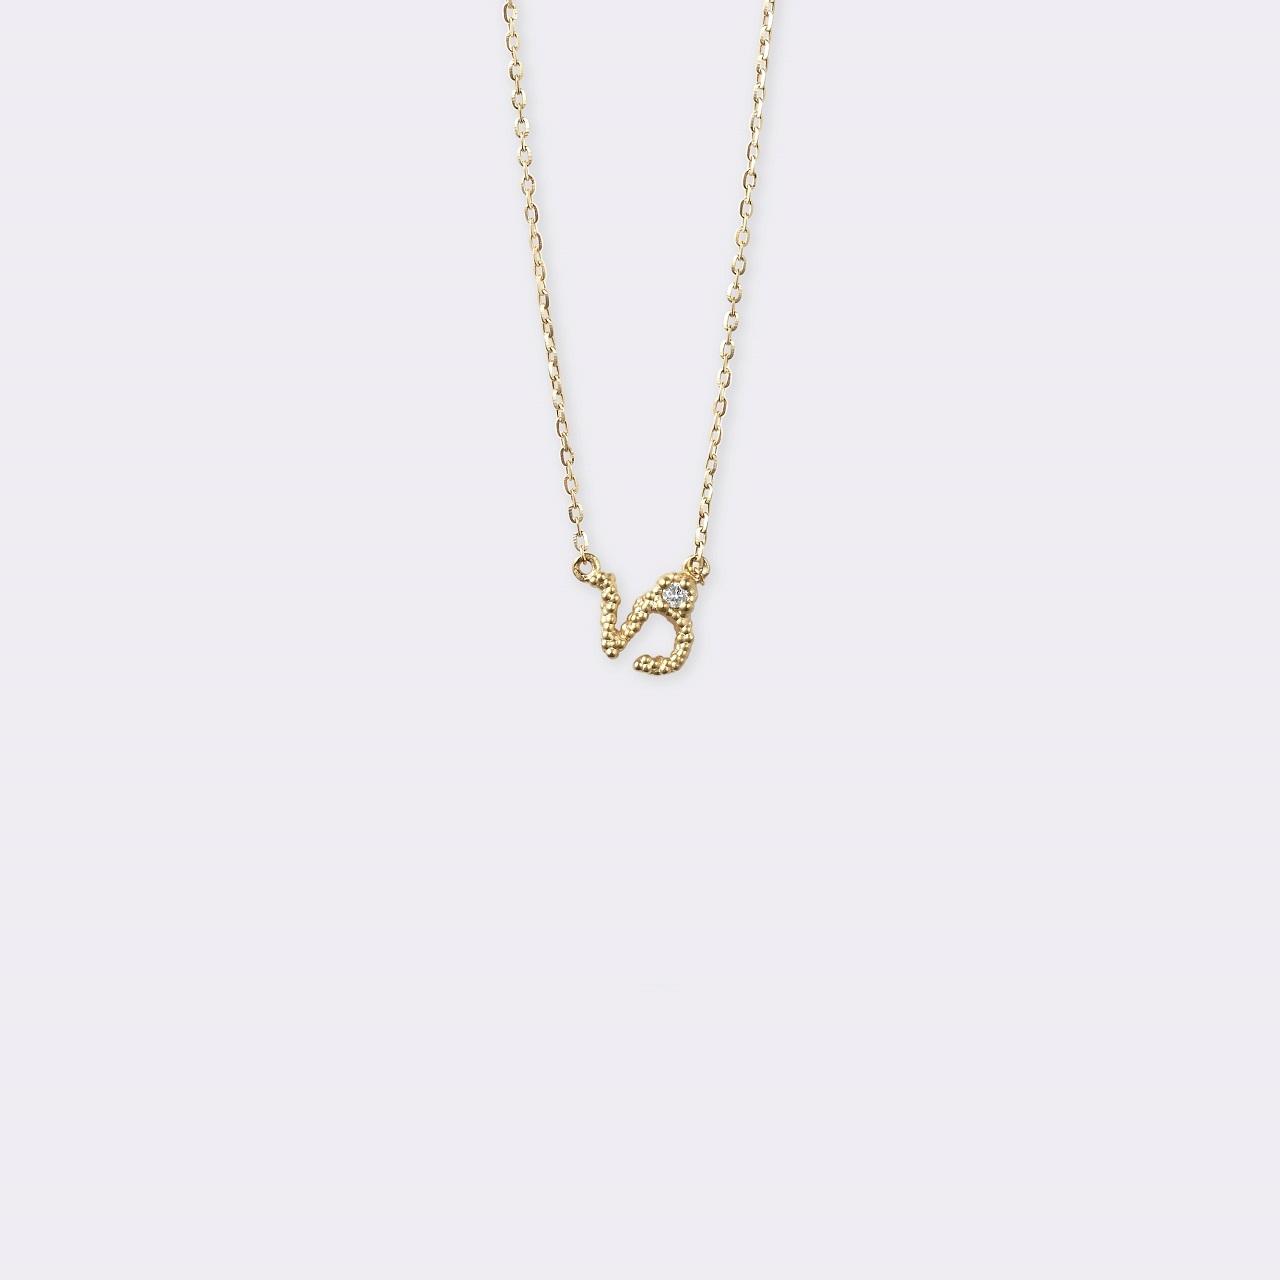 Horoscope Necklace 山羊座 K18YG(ホロスコープネックレス やぎ座 K18イエローゴールド)